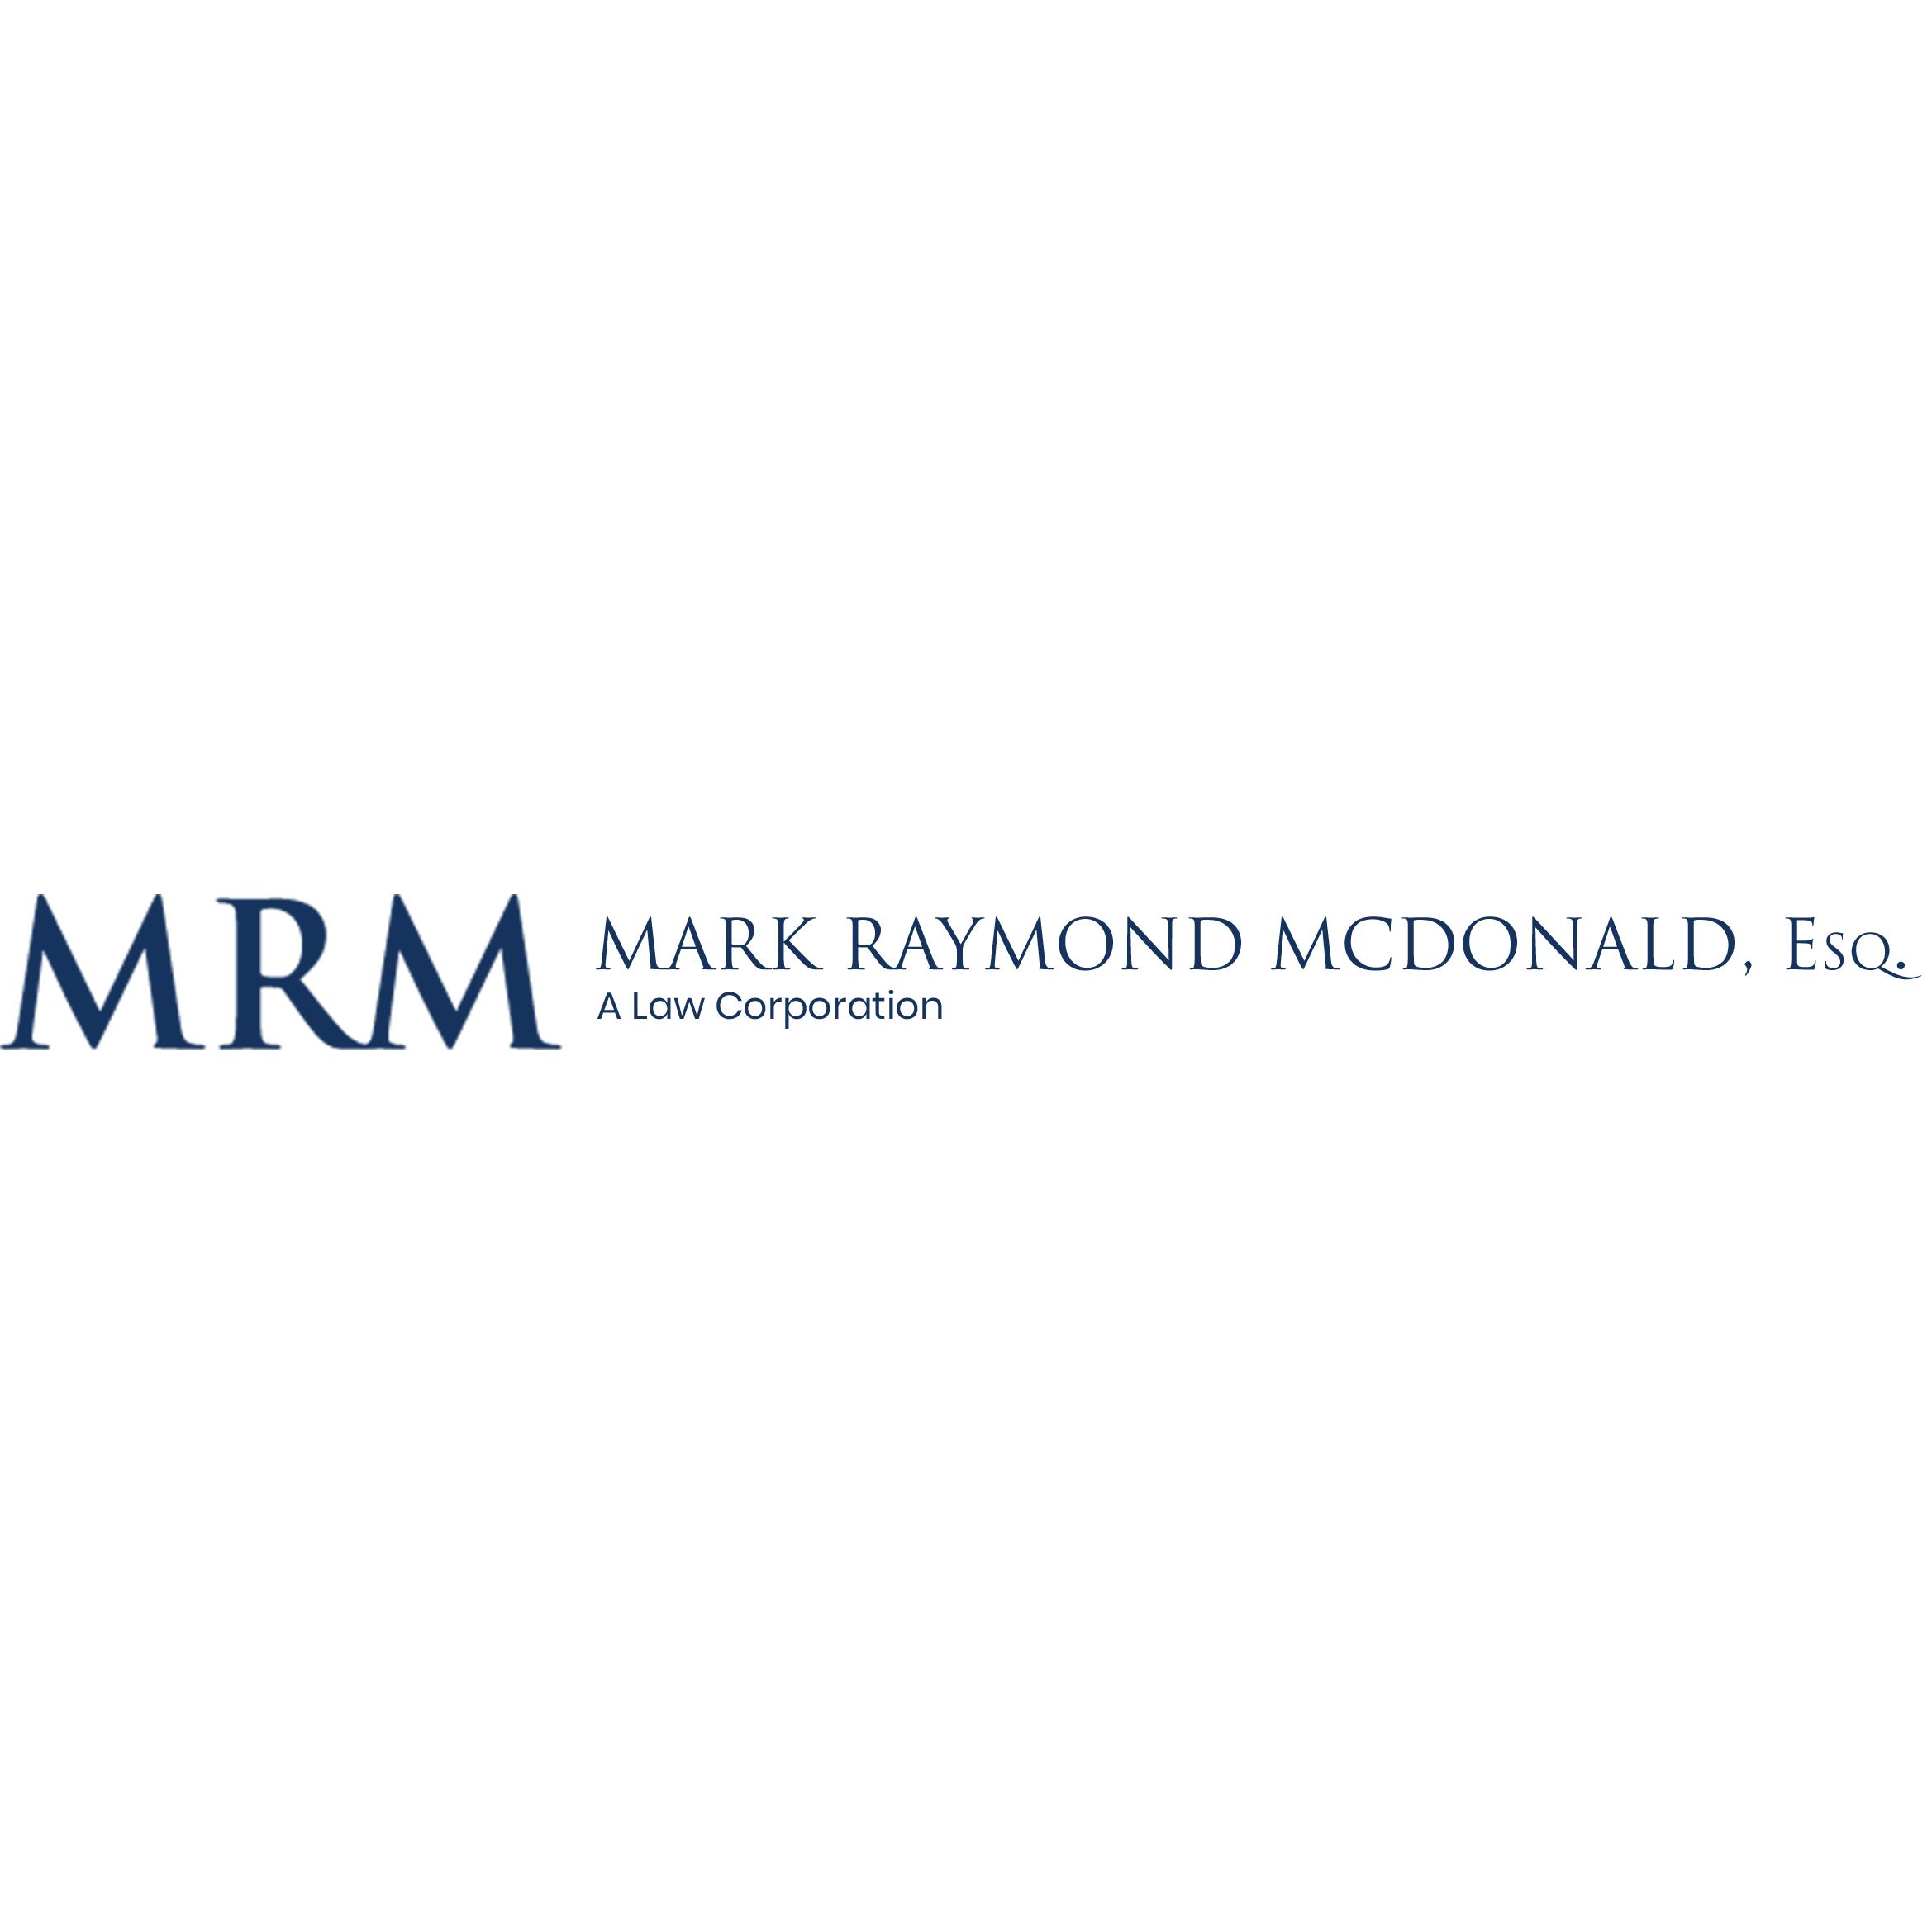 Mark Raymond McDonald, Esq., A Law Corporation image 1